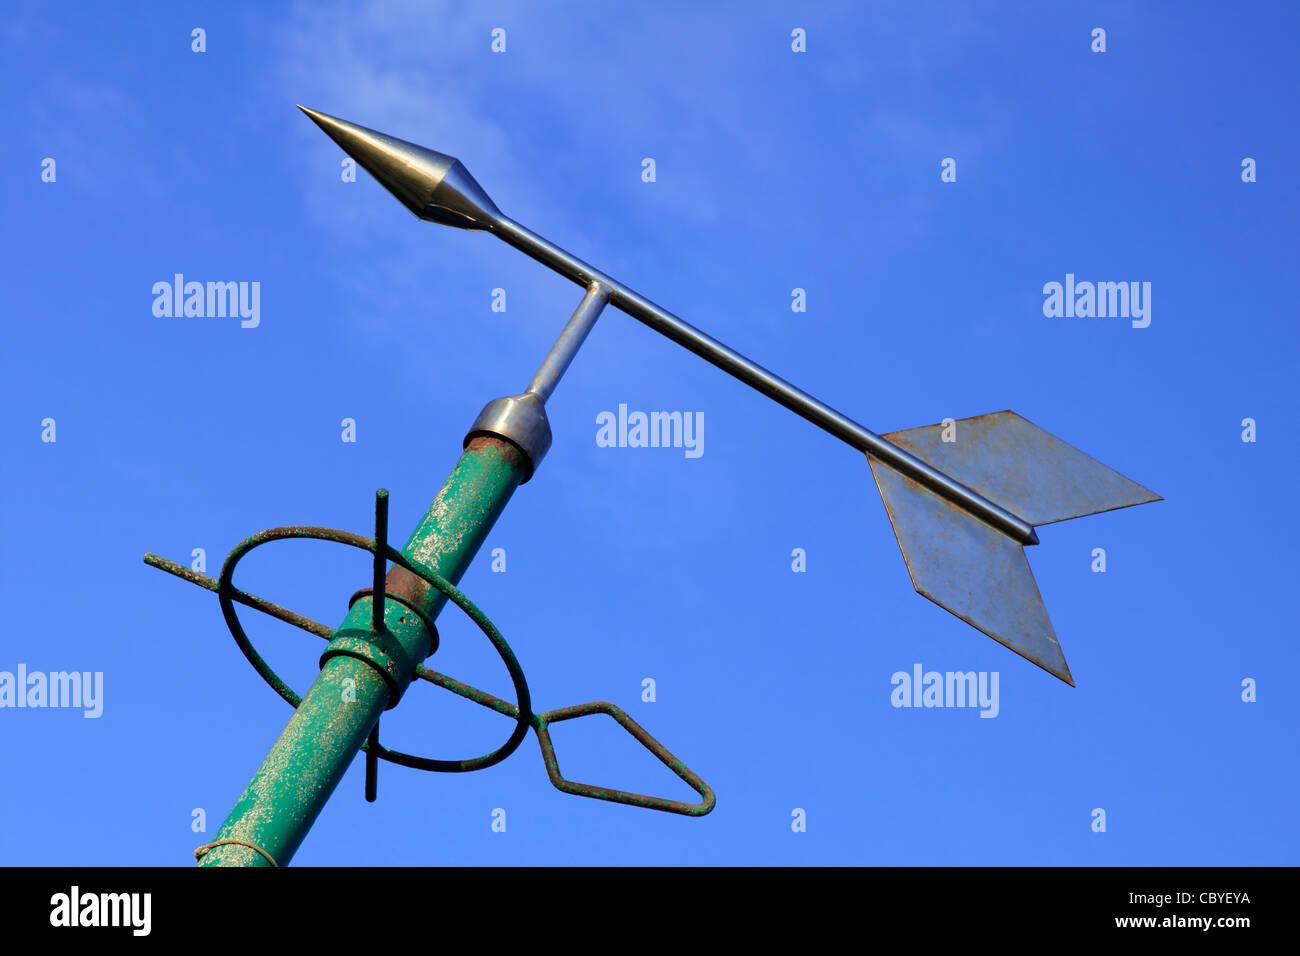 weather vane against blue sky - Stock Image